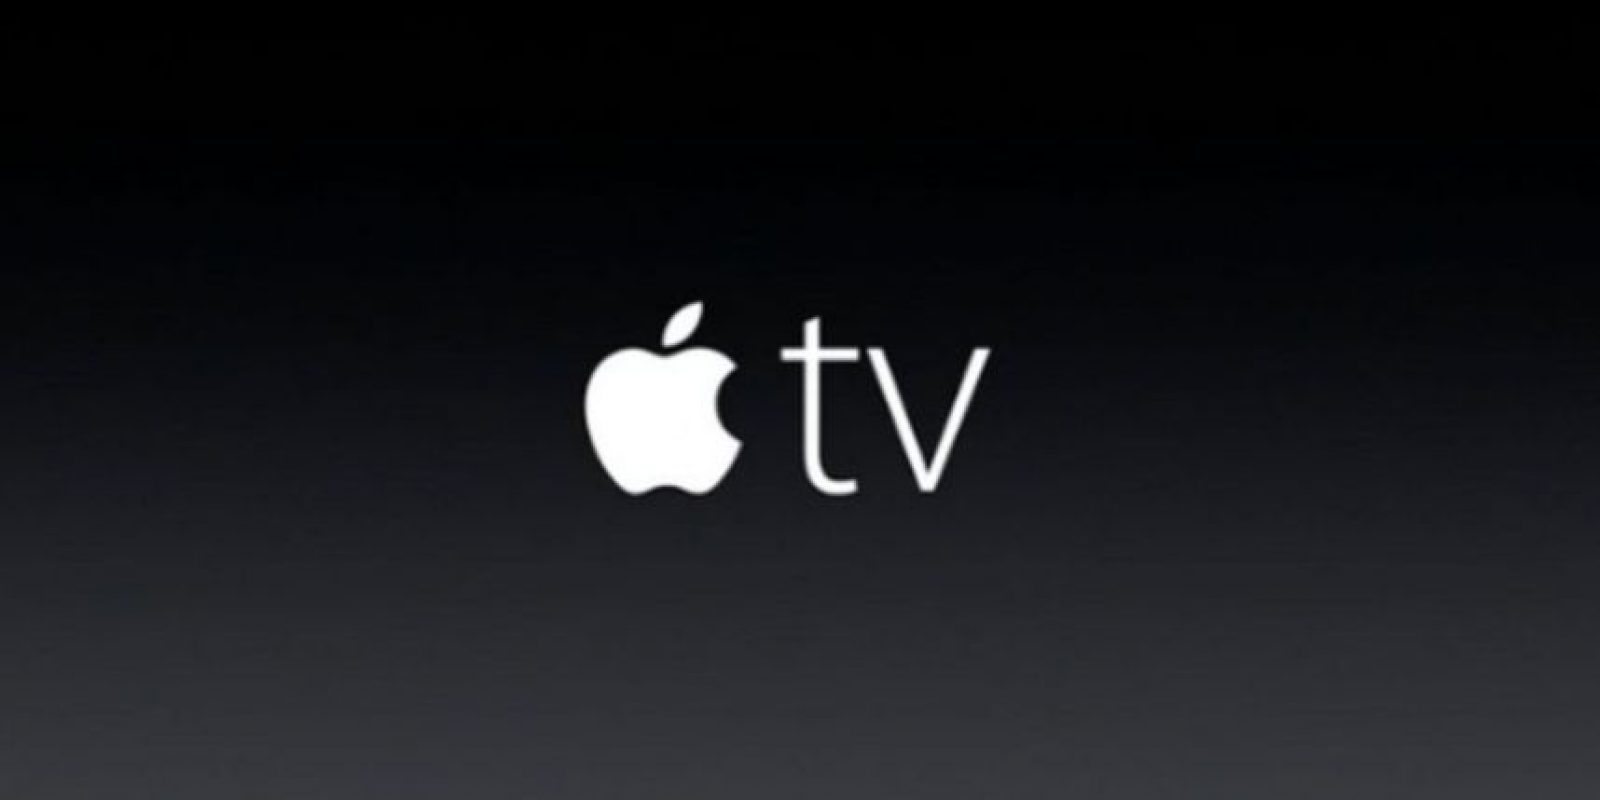 Apple TV permite reproducir contenido multimedia. Foto:Apple